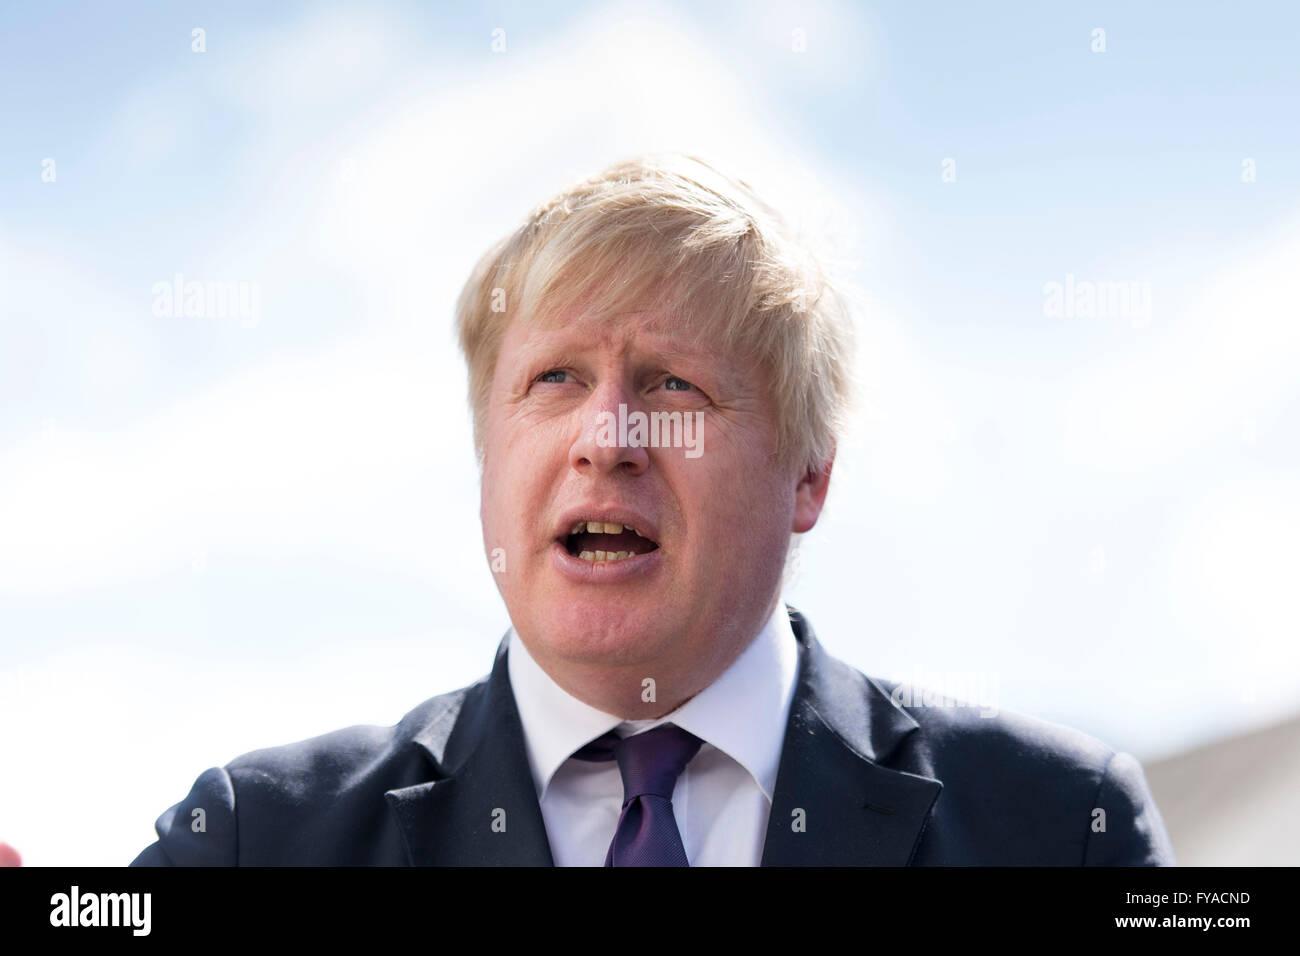 Boris Johnson Mayor of London and MP for Uxbridge and South Ruislip - Stock Image